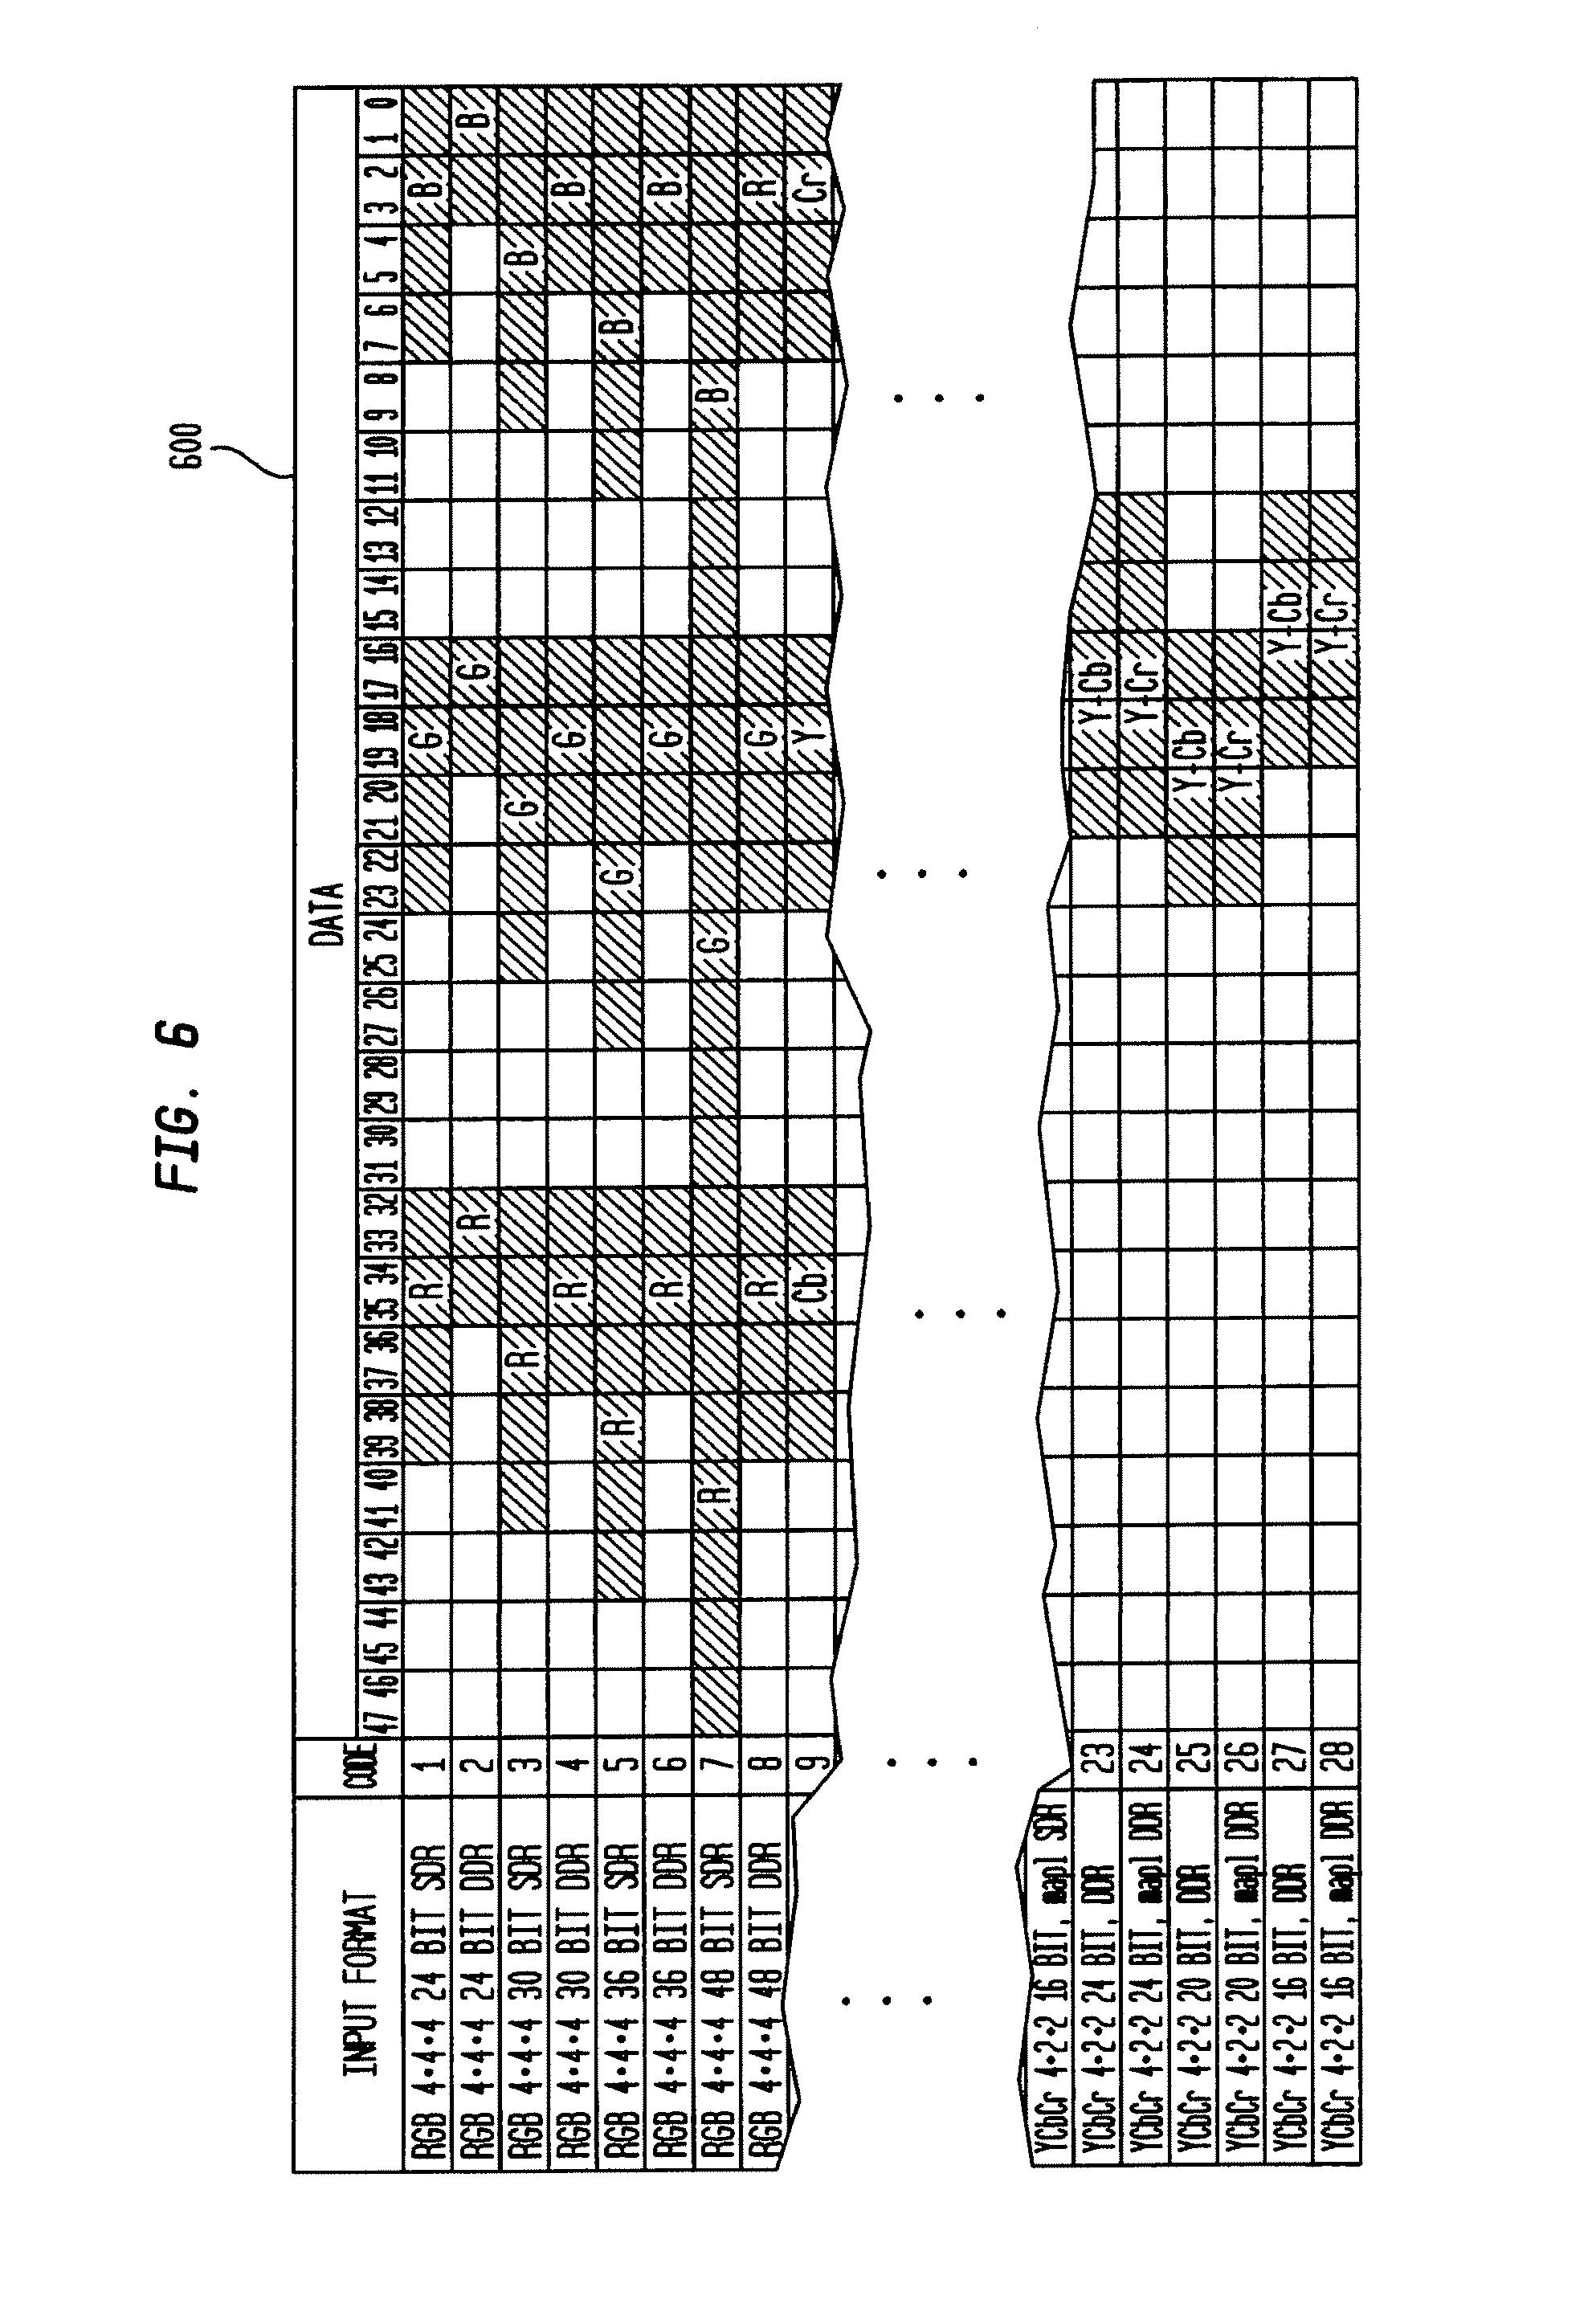 Patent US8195843 - HDMI controller circuit for transmitting